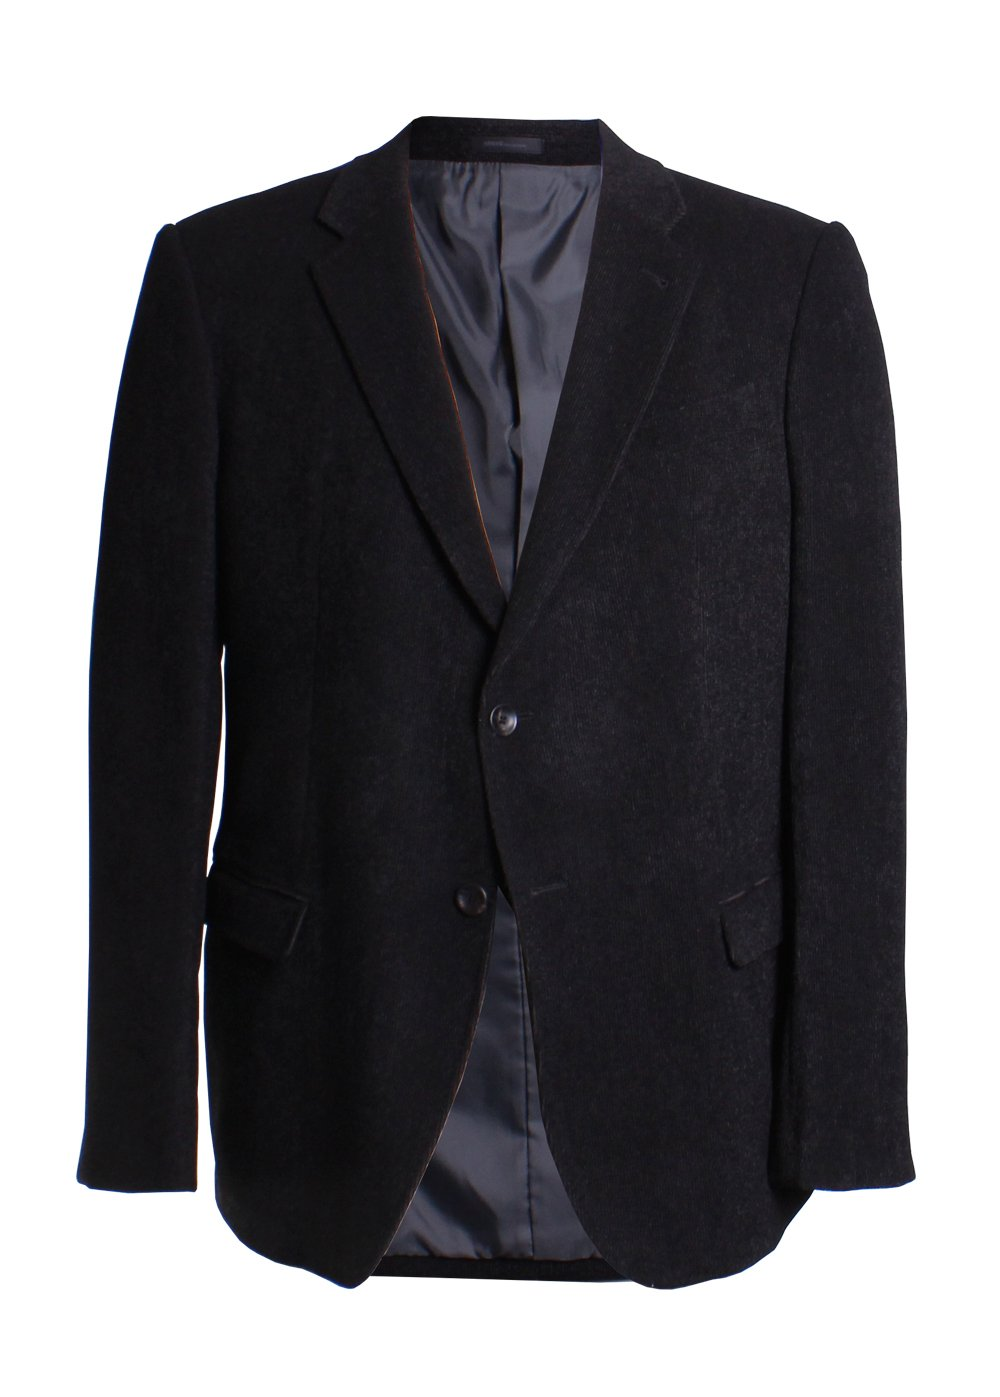 Armani Sportcoat 54 Charcoal